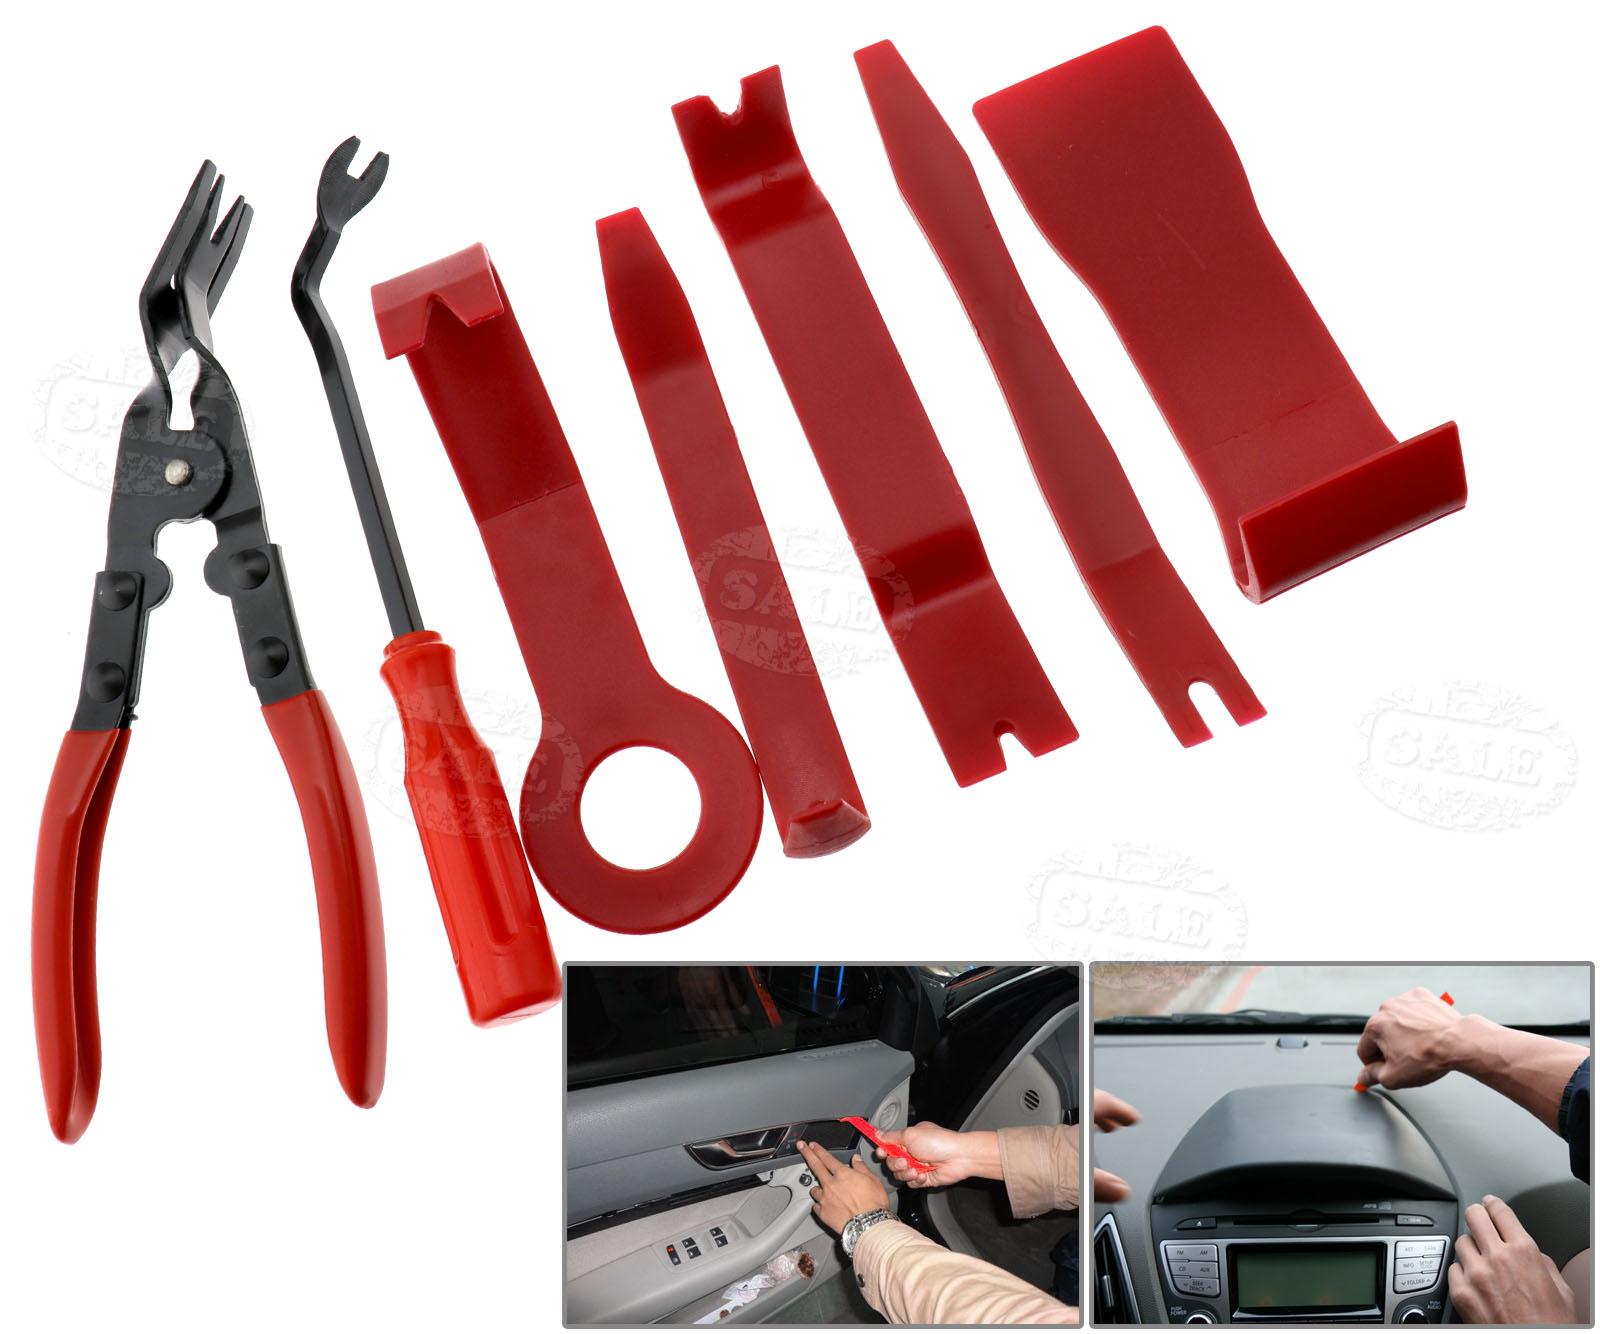 car interior radio door panel trim clip removal plier upholstery remover tool 608415764007 ebay. Black Bedroom Furniture Sets. Home Design Ideas